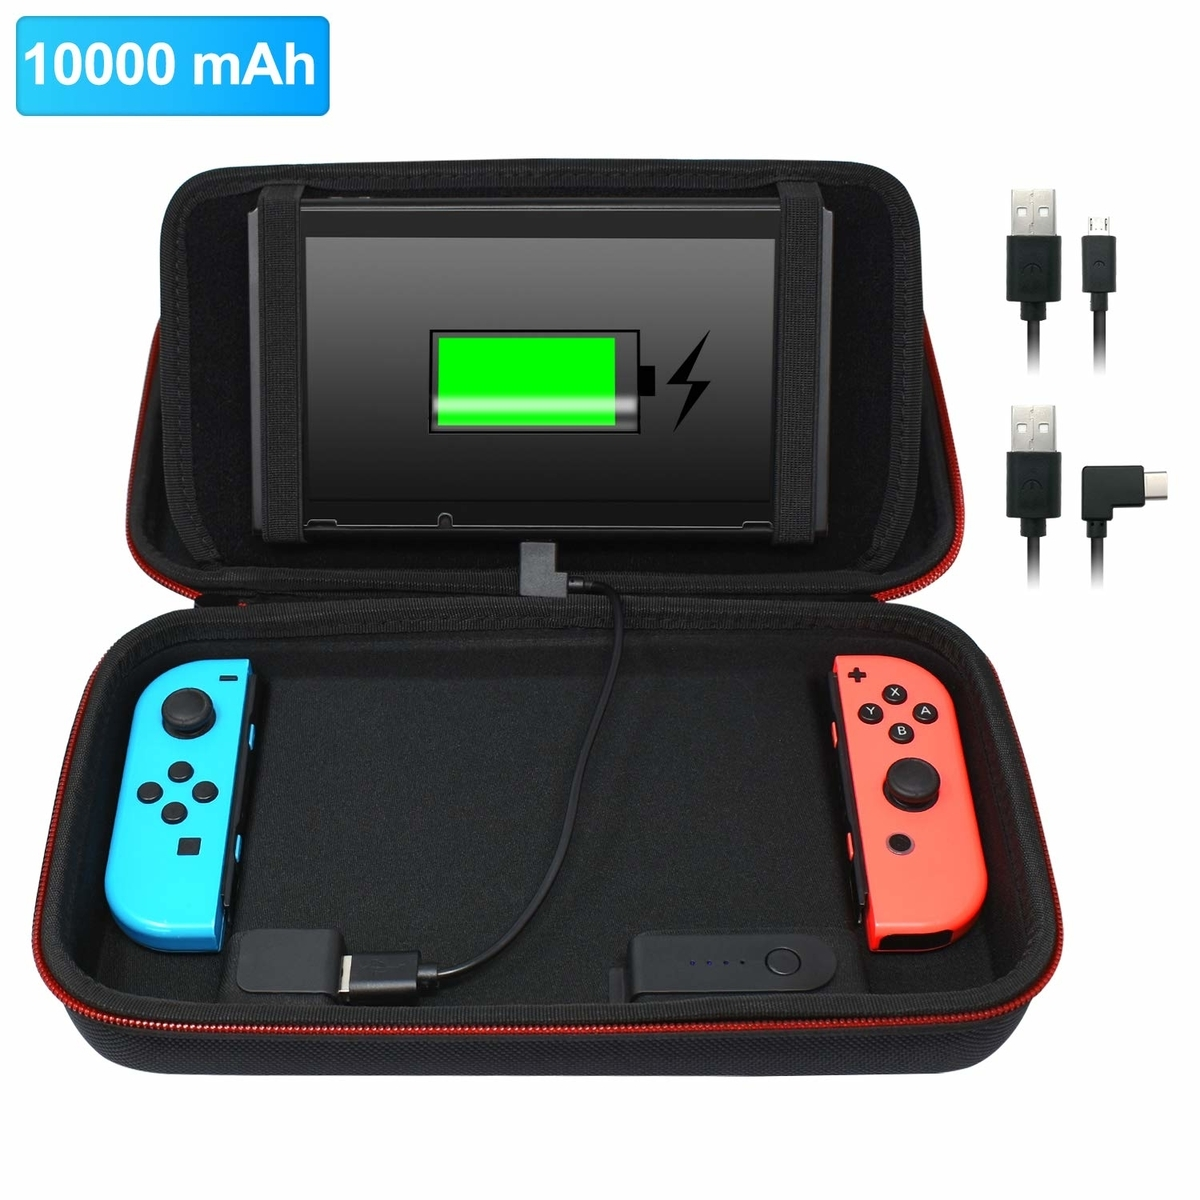 f:id:NintendoDaily:20190813194628j:plain